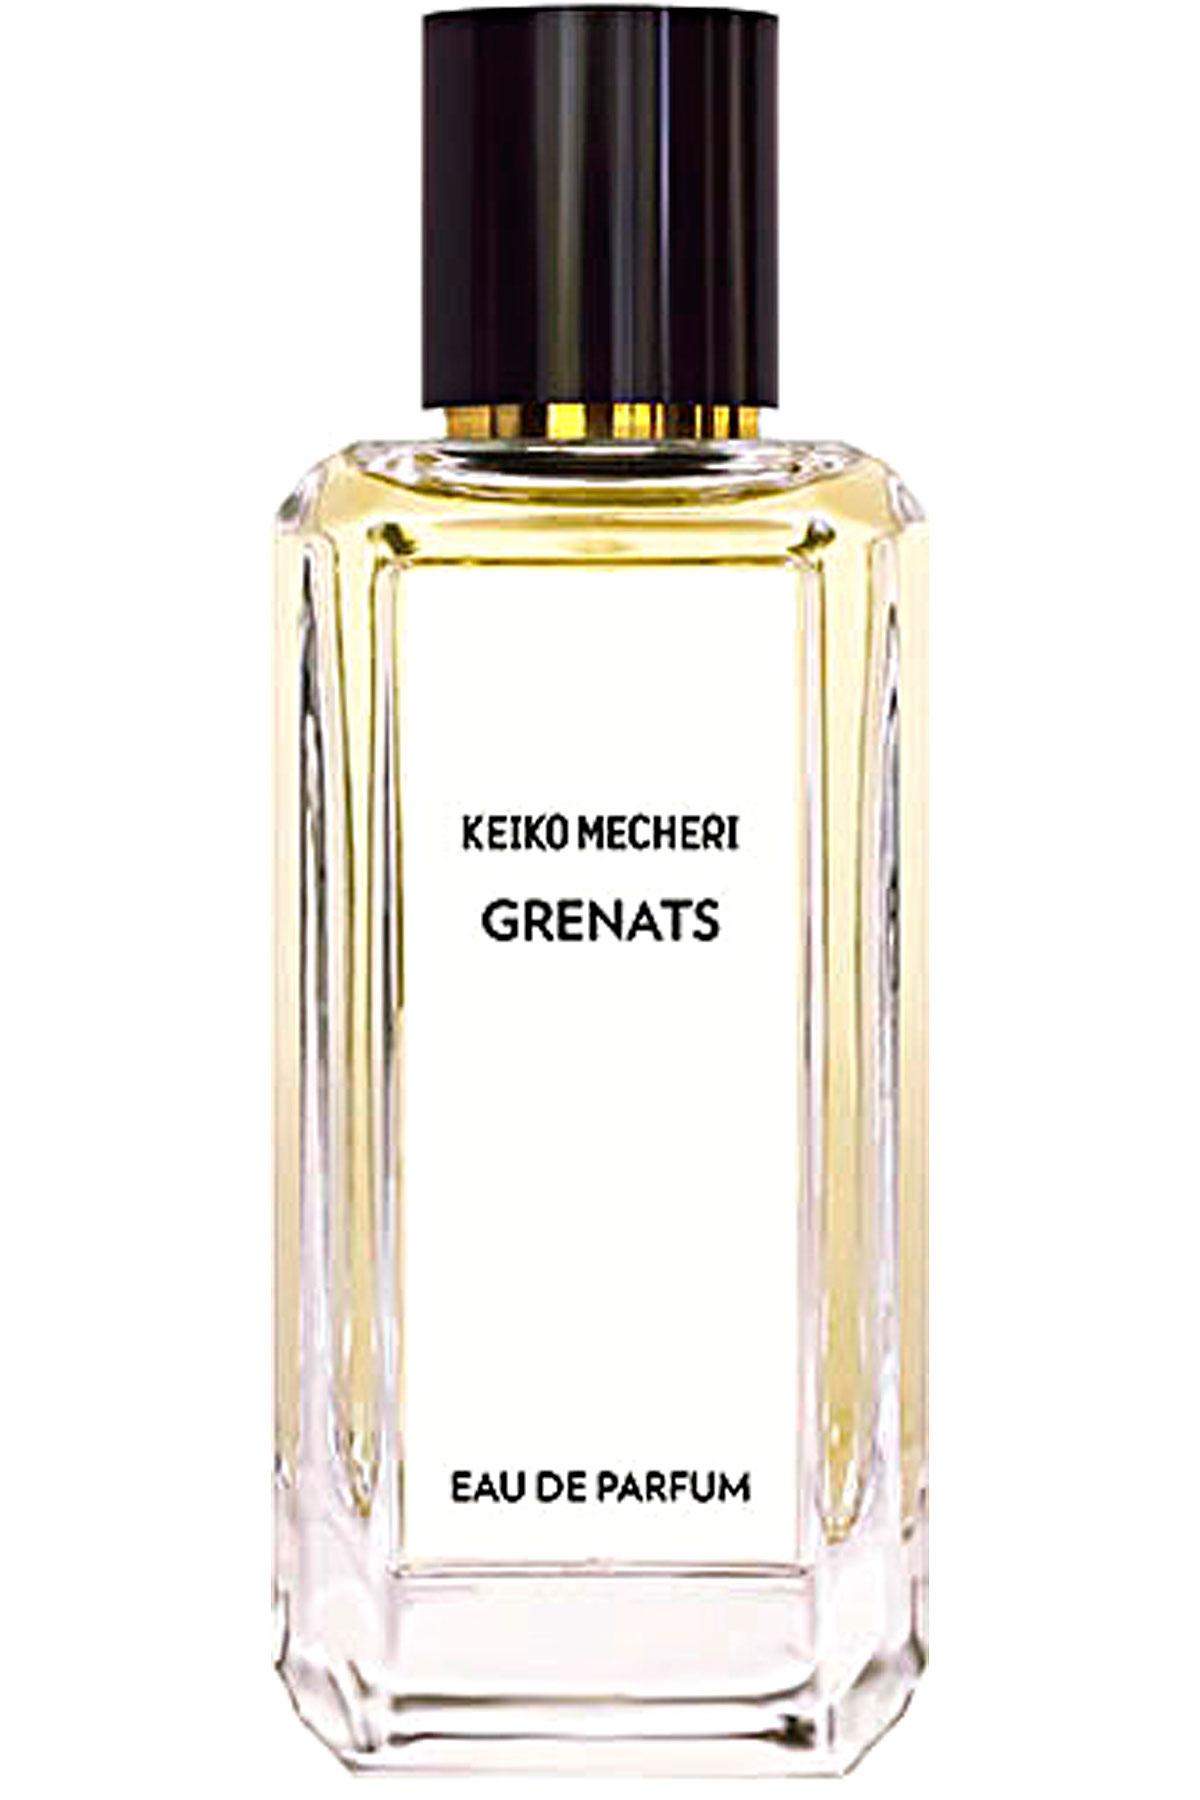 Keiko Mecheri Fragrances for Women, Grenats - Eau De Parfum - 100 Ml, 2019, 100 ml